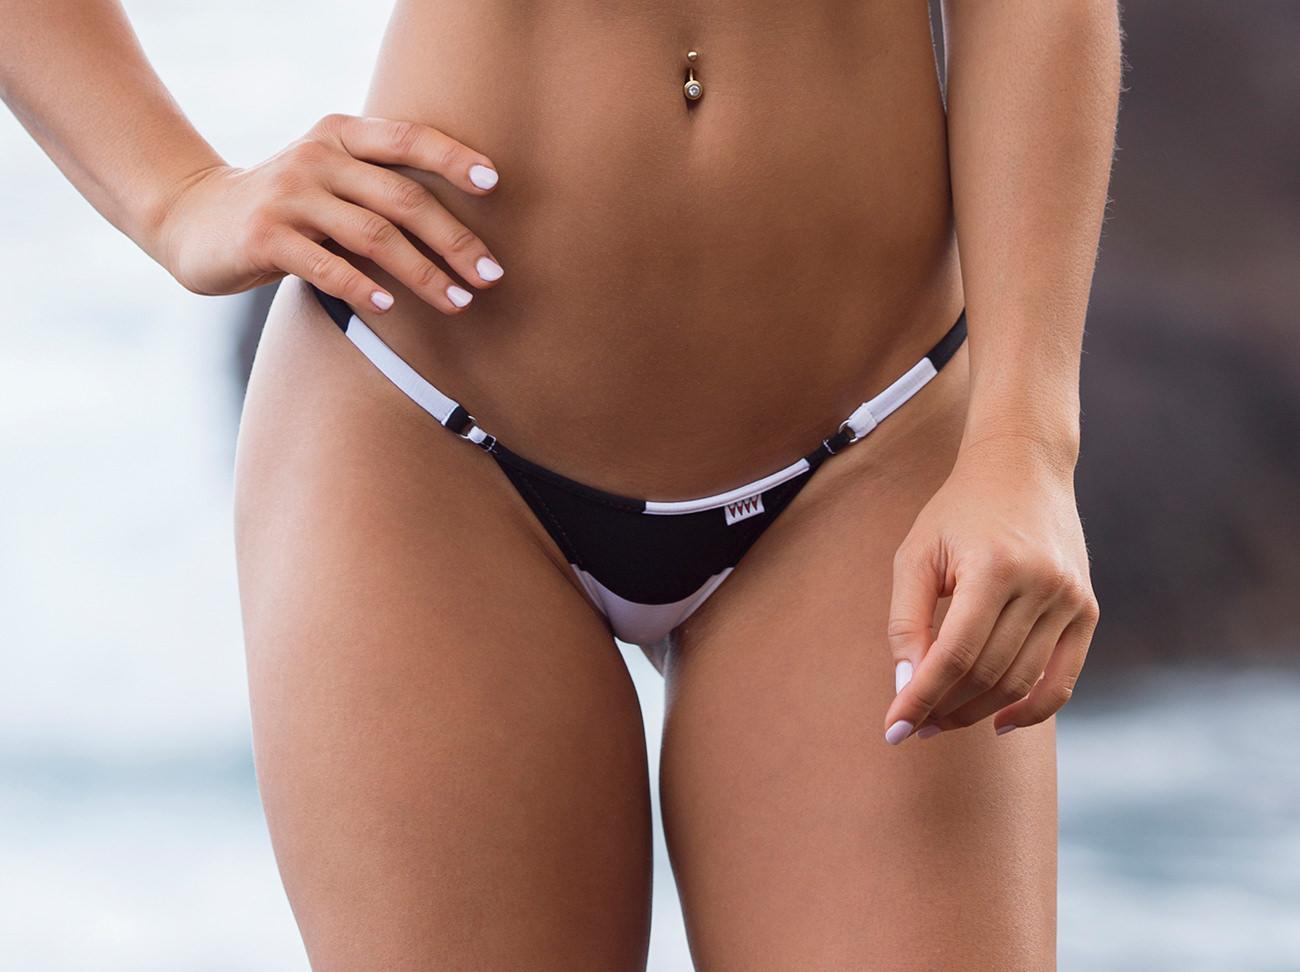 Bikini Competition Winner Image